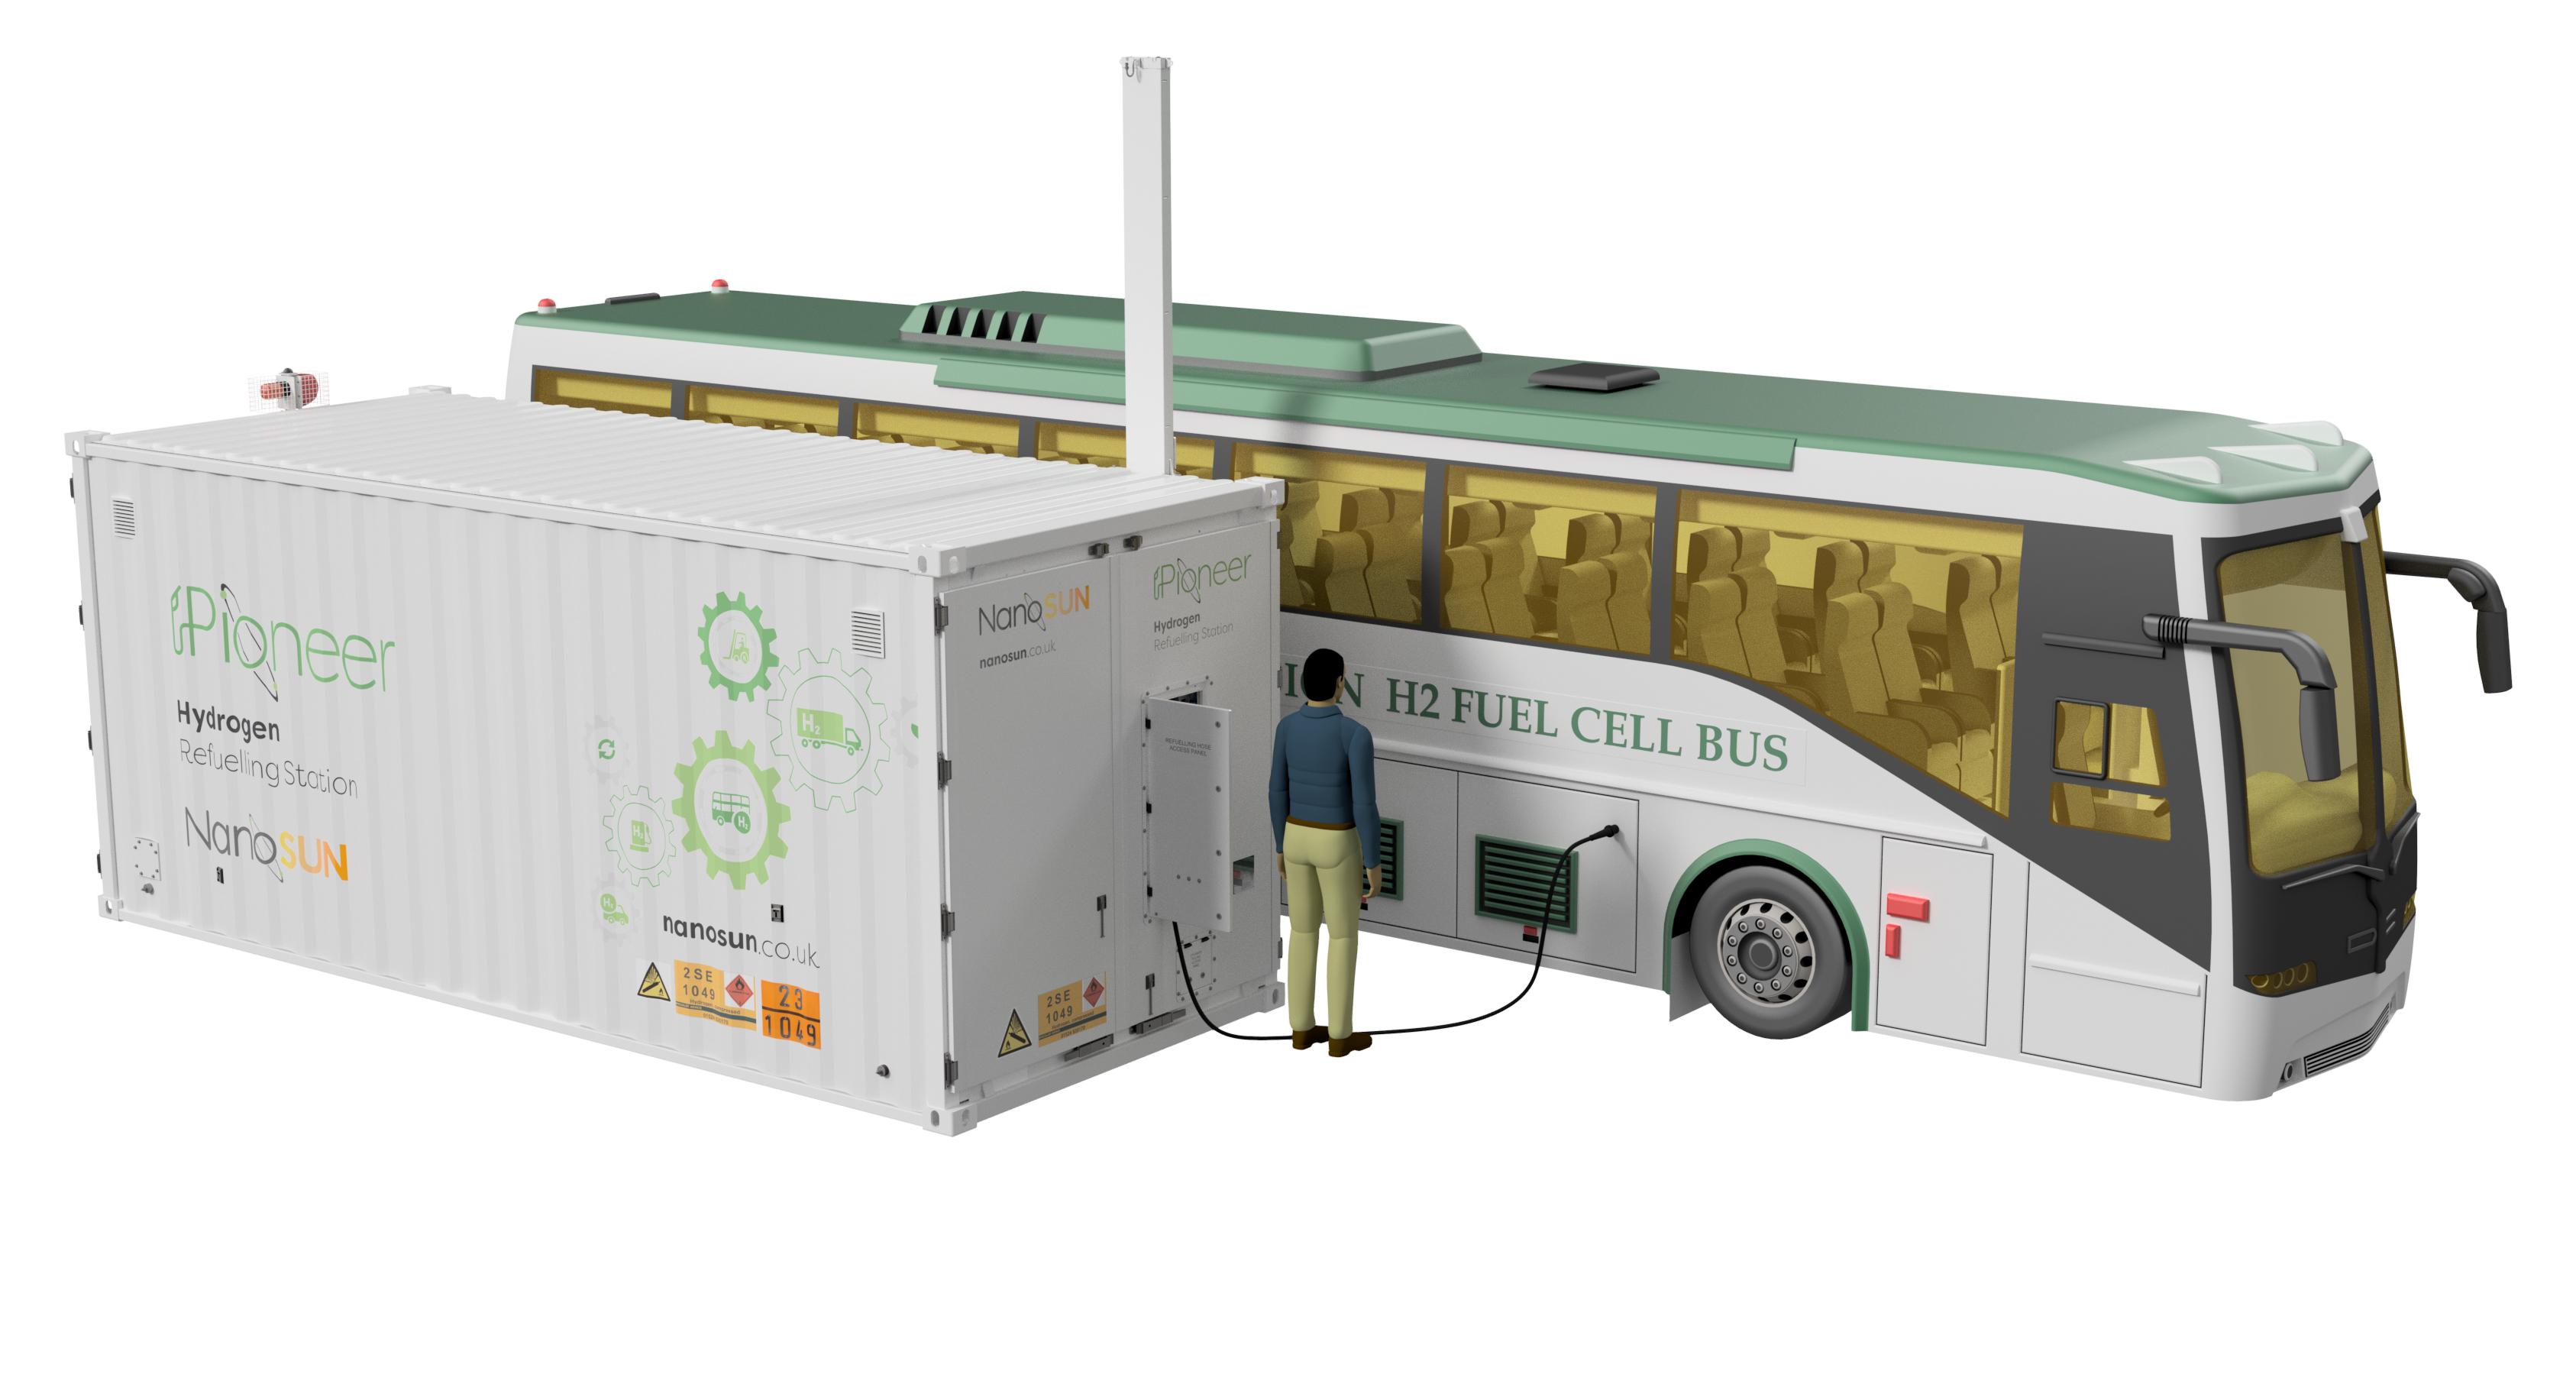 NanoSUN Pioneer Hydrogen Refuelling Station